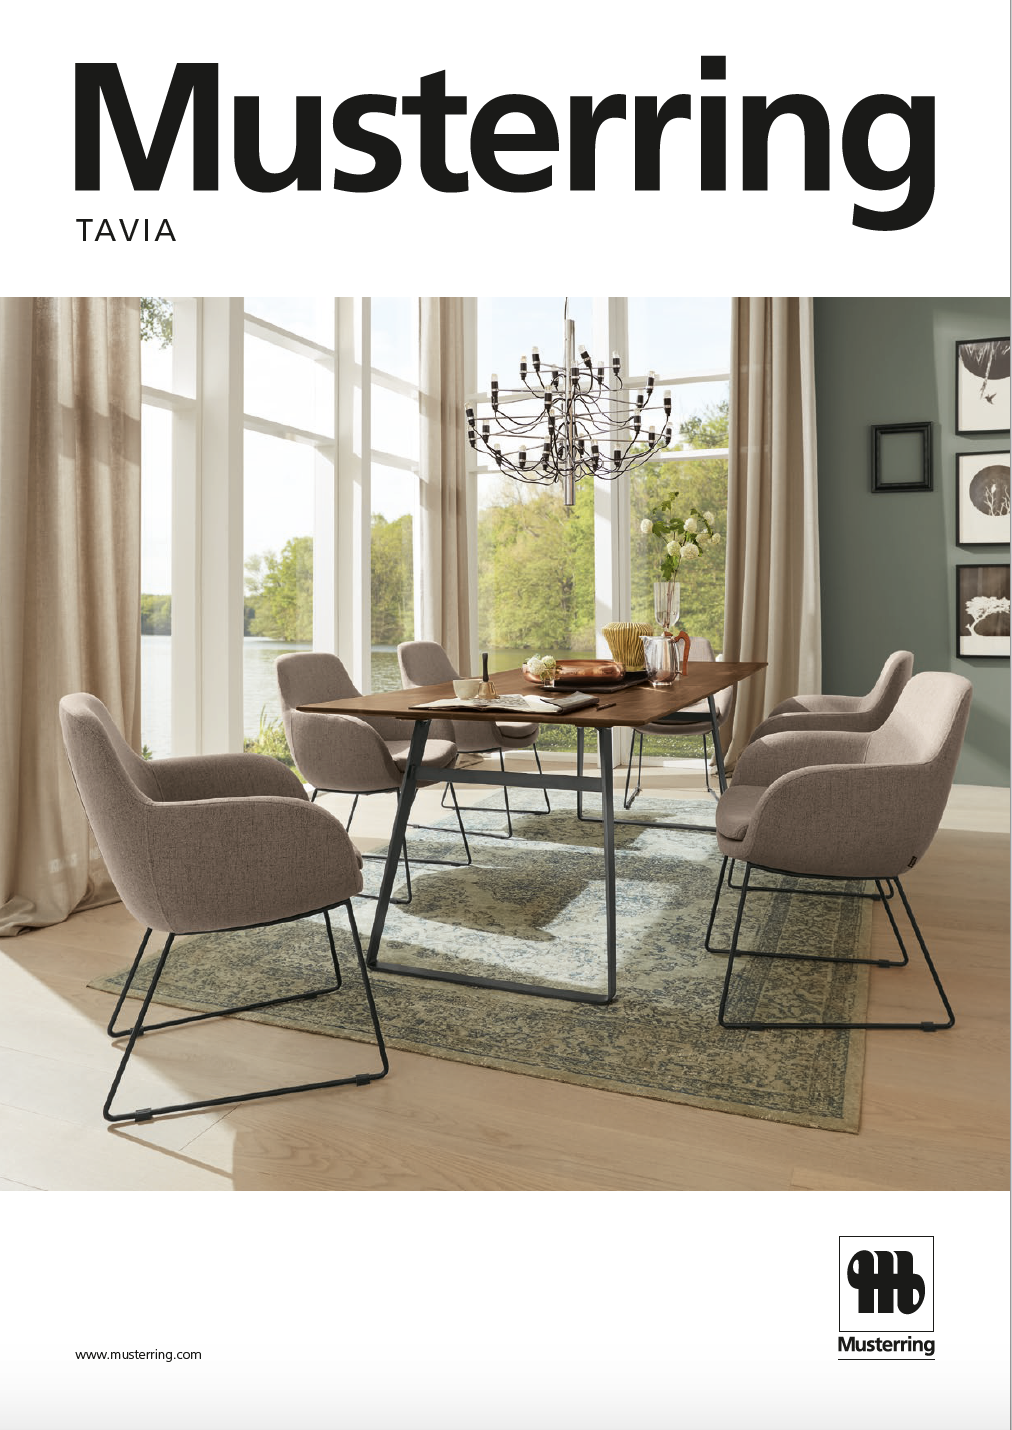 Musterring Katalog - Serie Tavia